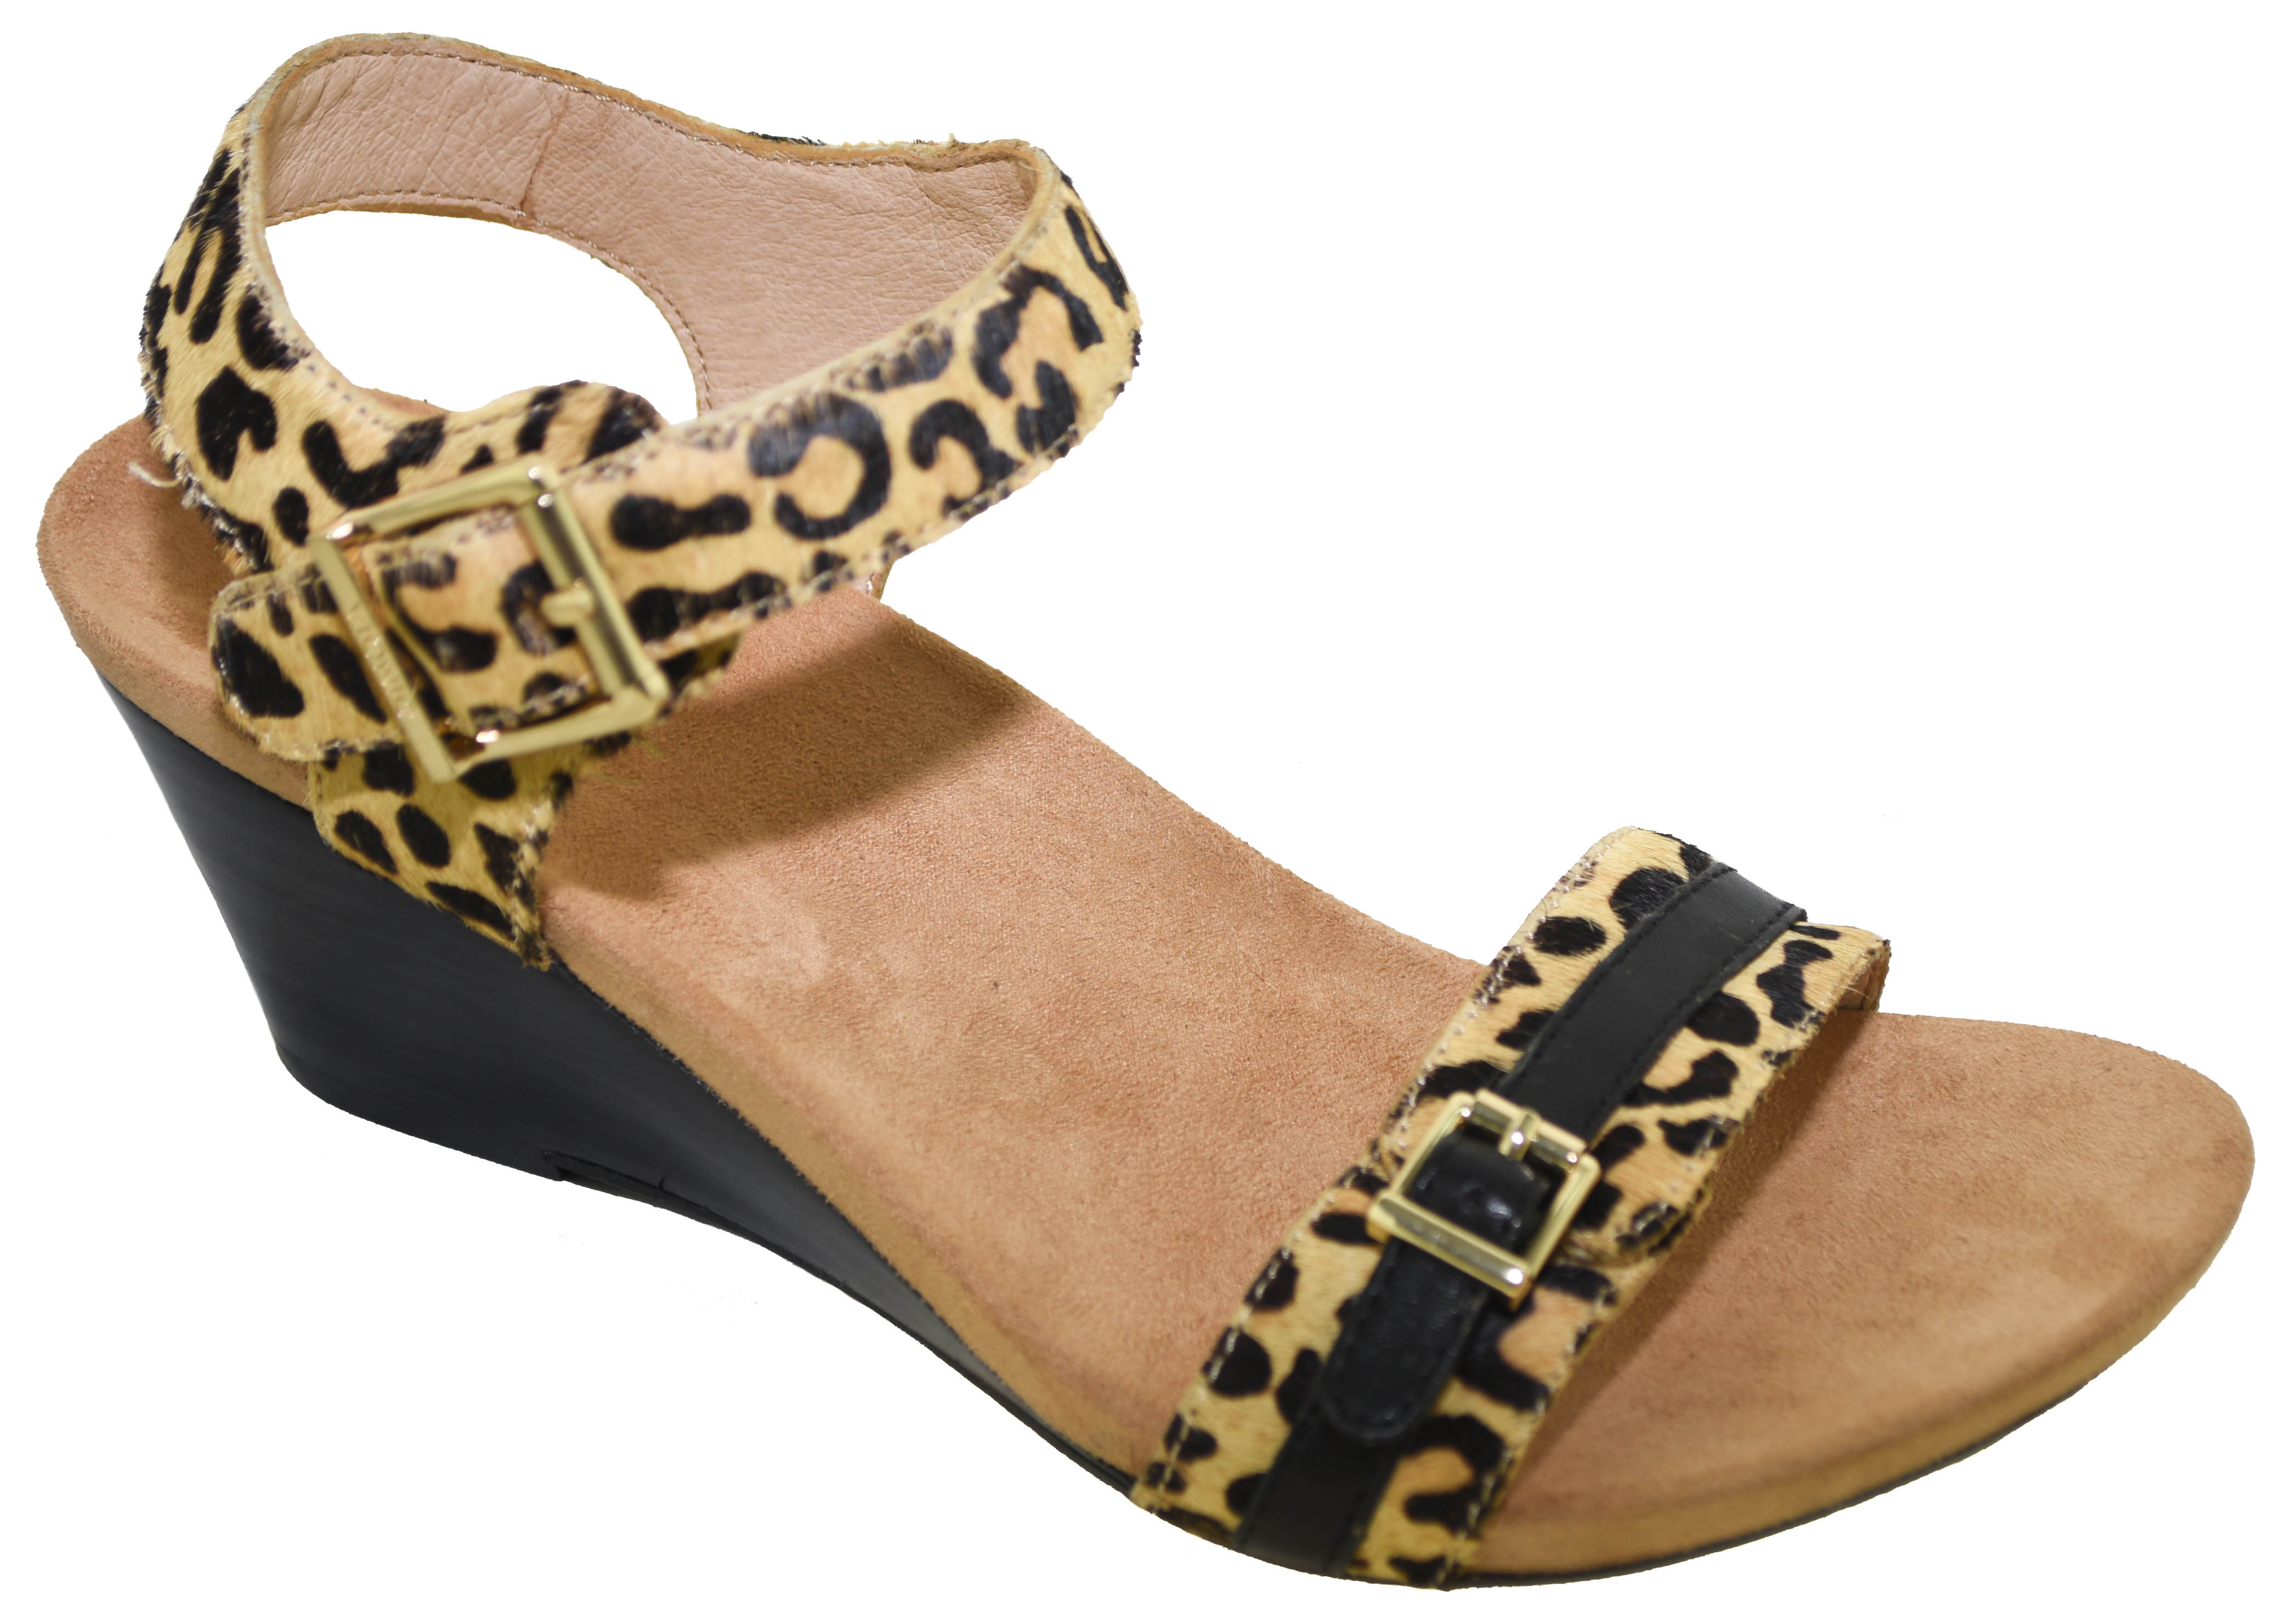 b8c89a0dcf63 Vionic Women s Noble Laurie Wedge Sandal Tan Leopard Style 382